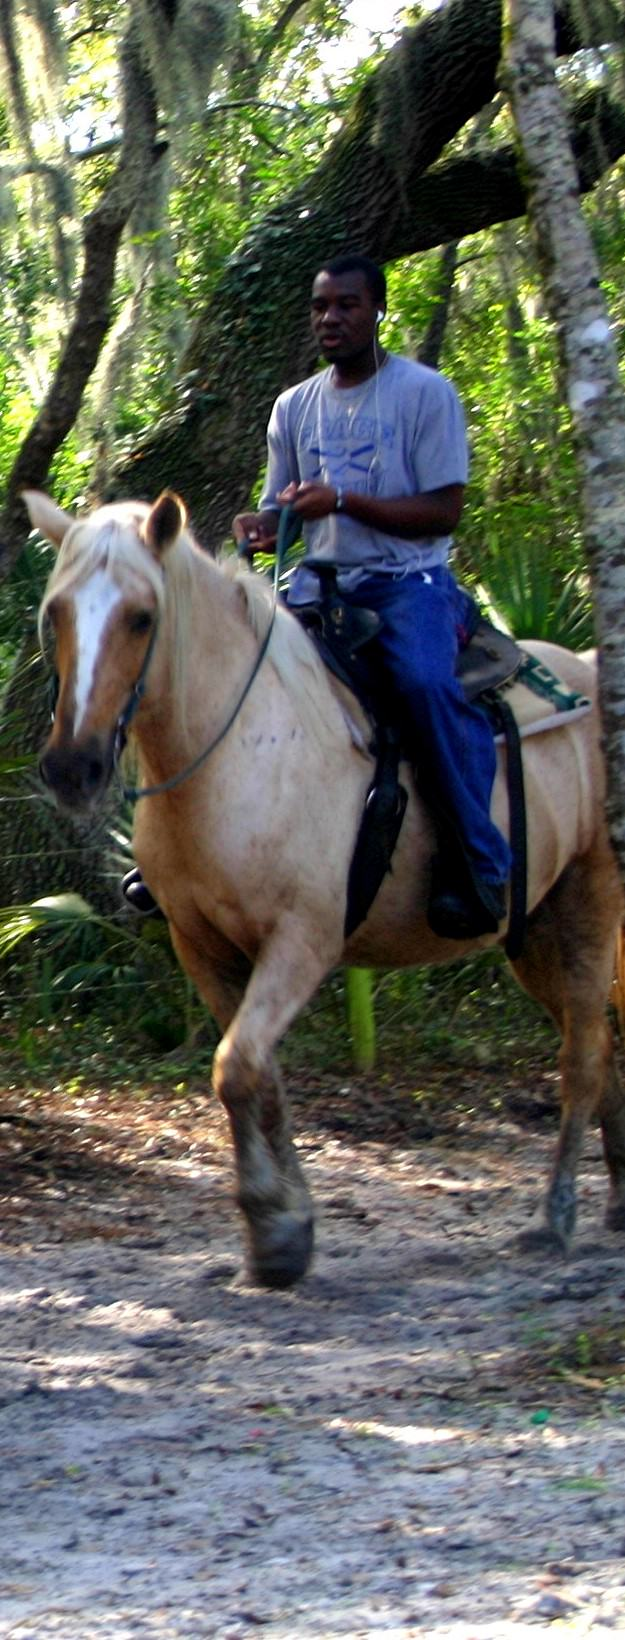 Horseback Riding - Trail Rides - Sun City Stables